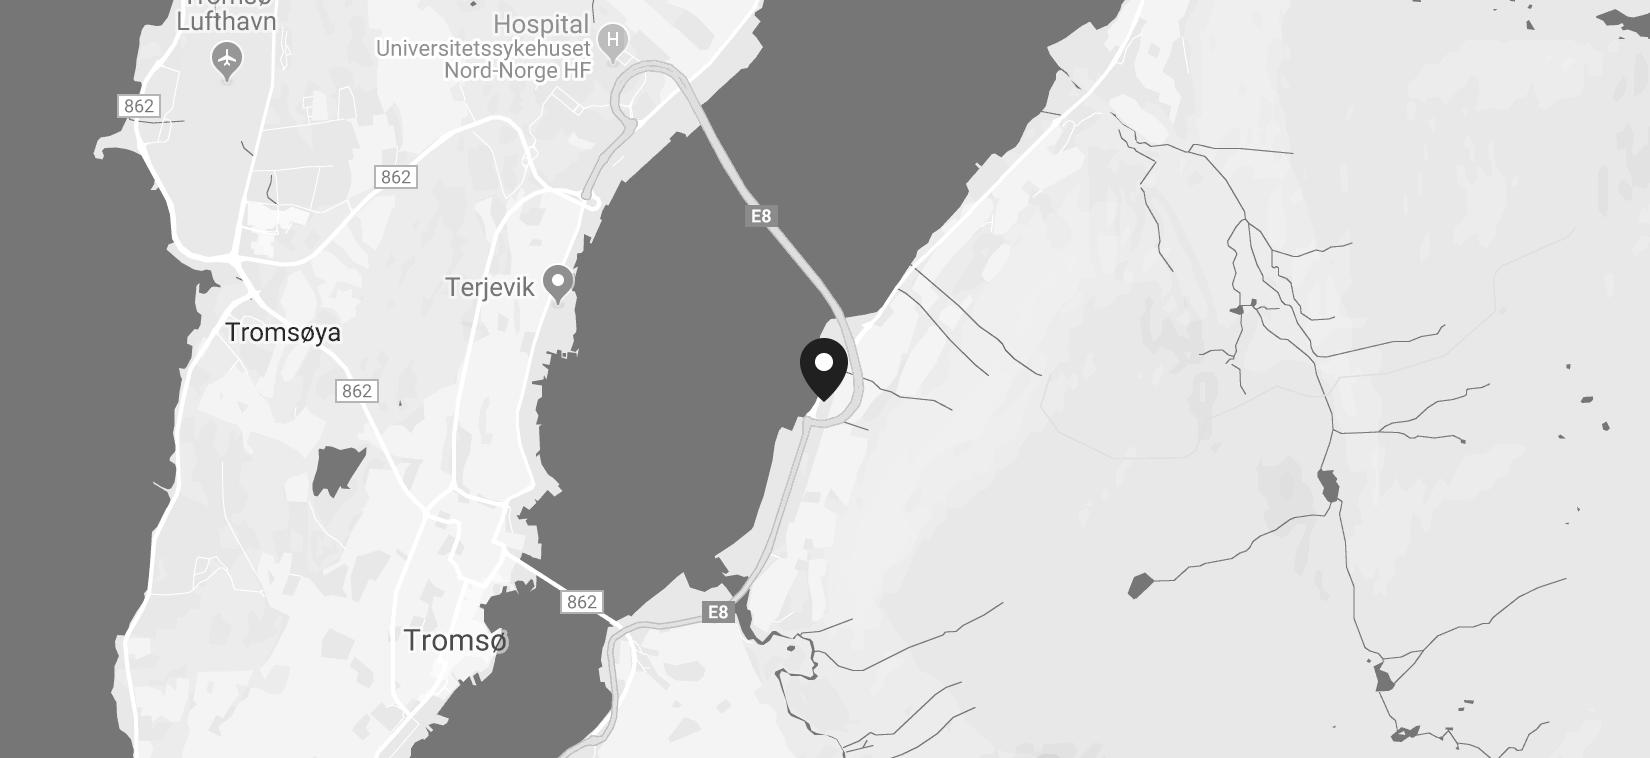 Tannklinikk 1 Tromsø Google Kart.png